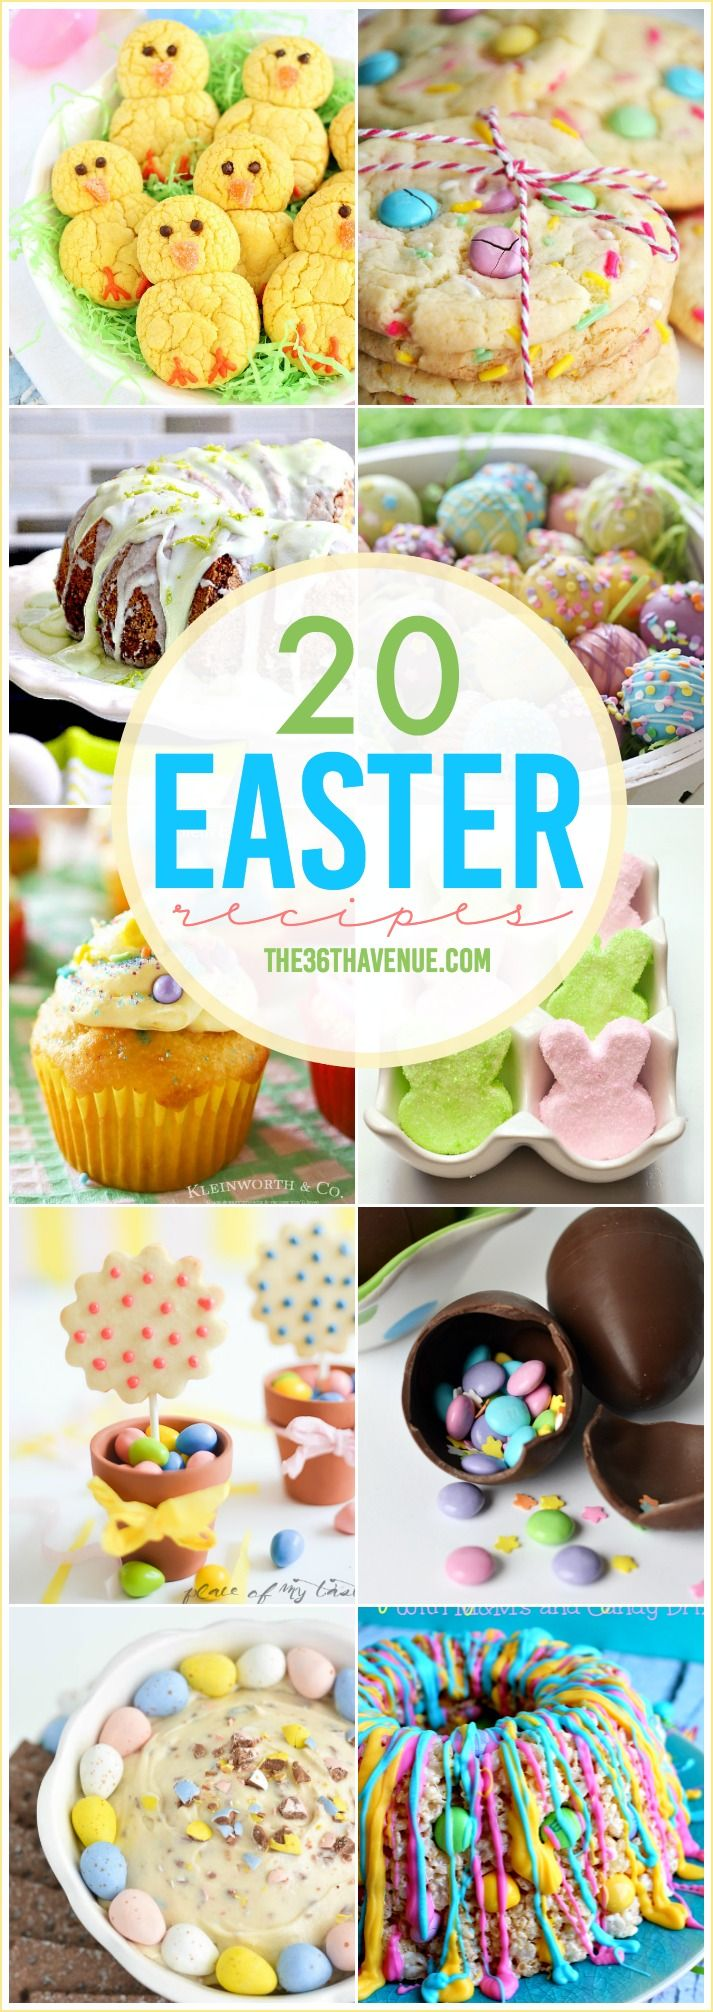 1000 images about easter ideas on pinterest easter for Dessert for easter dinner